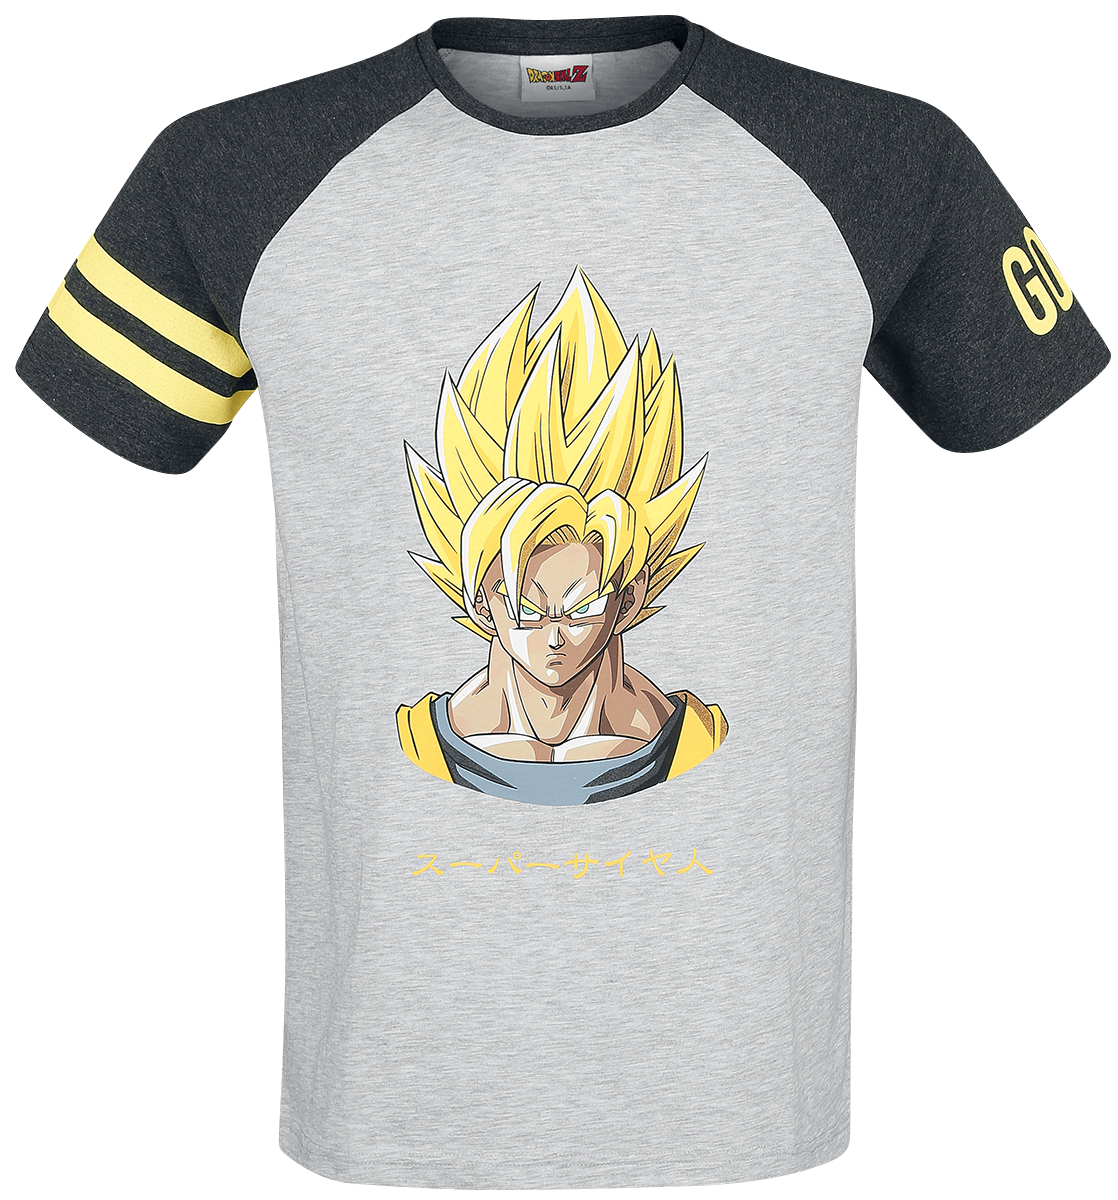 Dragon Ball - Z - Son Goku - T-Shirt - grey/black/yellow image